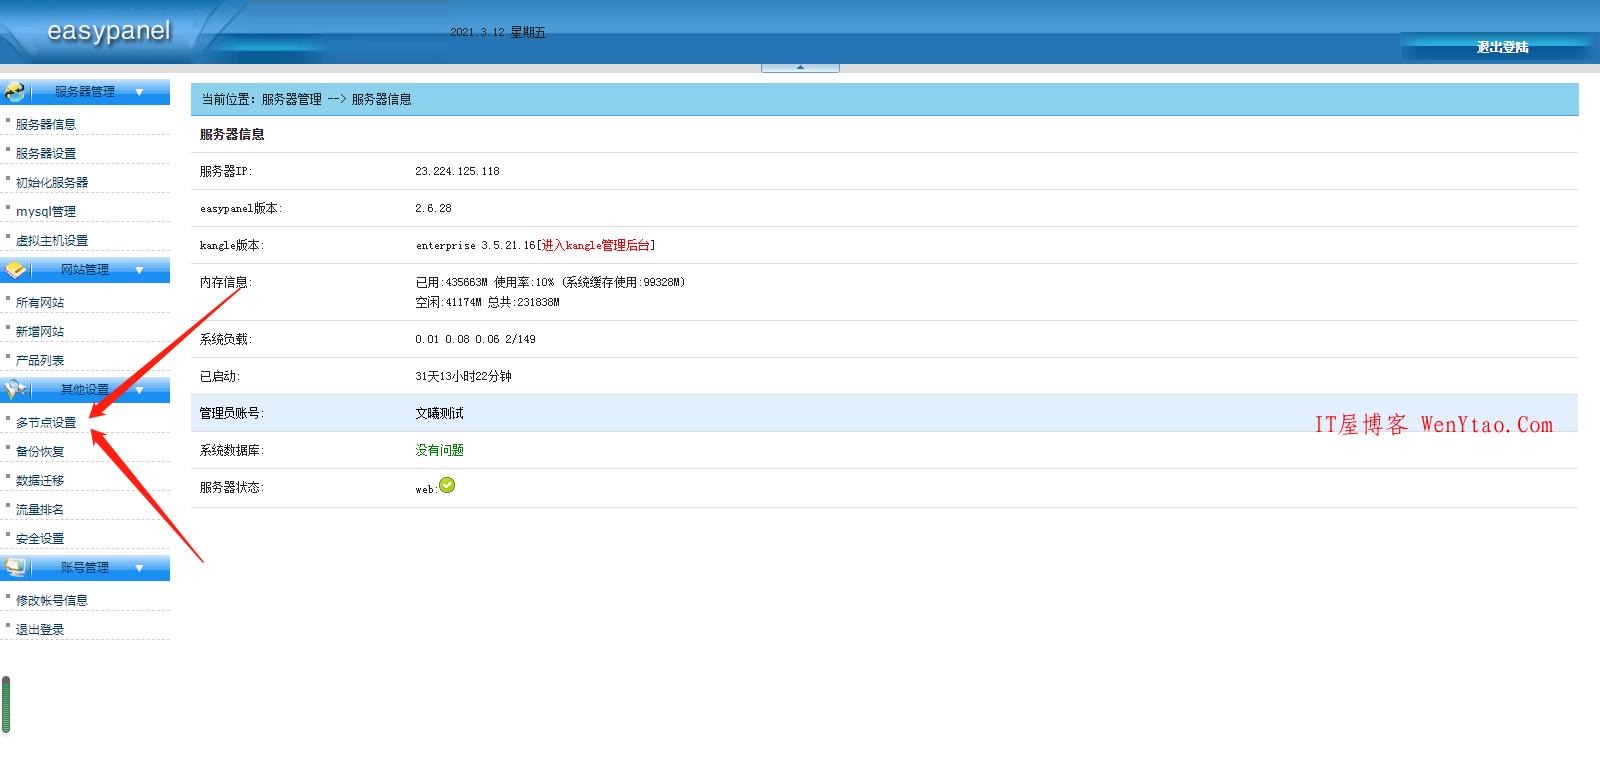 【教程】kangle配置cdn 用kangle+ep控制面板架设CDN详细图文教程